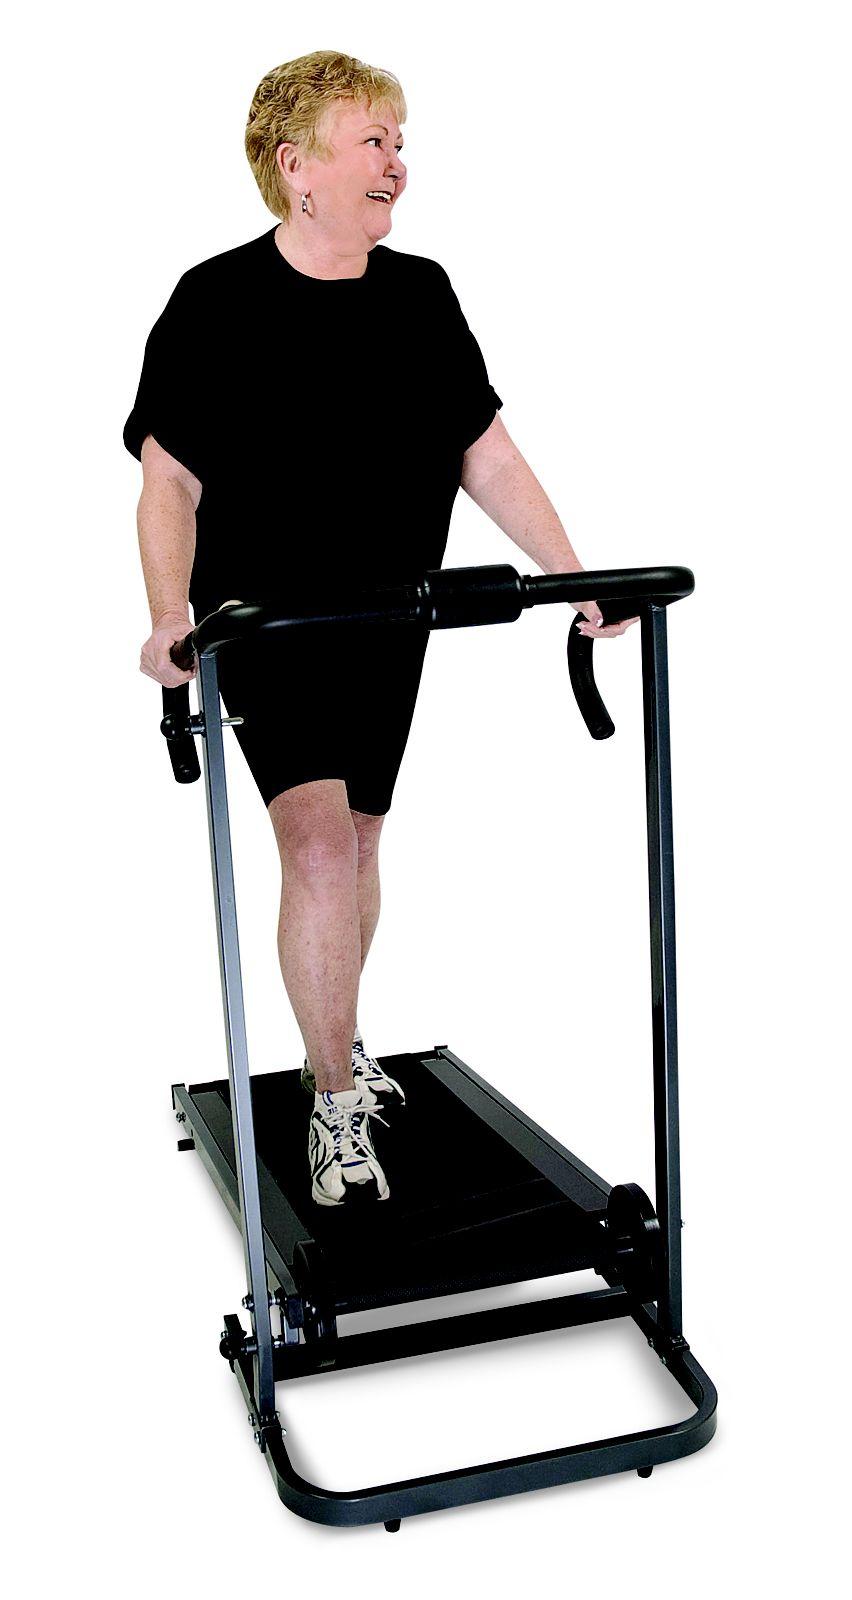 Elite Fitness Deluxe Manual Treadmill